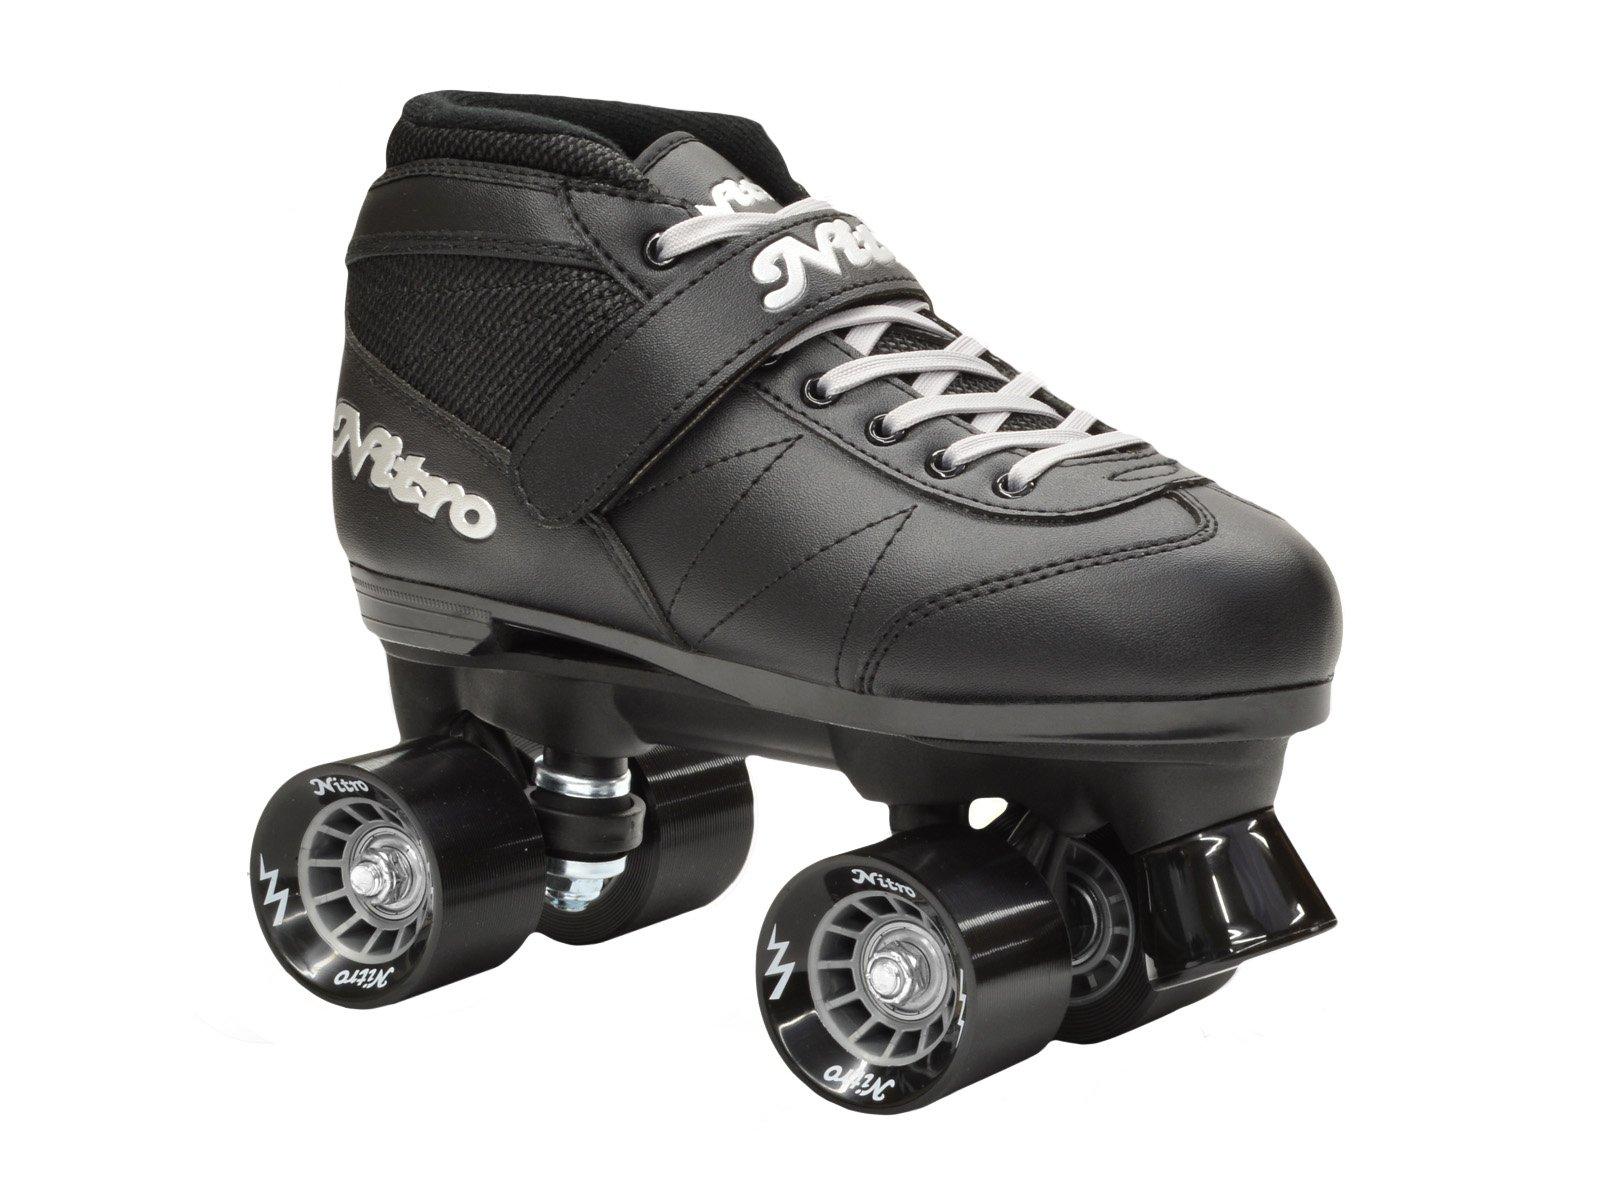 Epic Skates Super Nitro Quad Speed Skates, Black, Youth 3